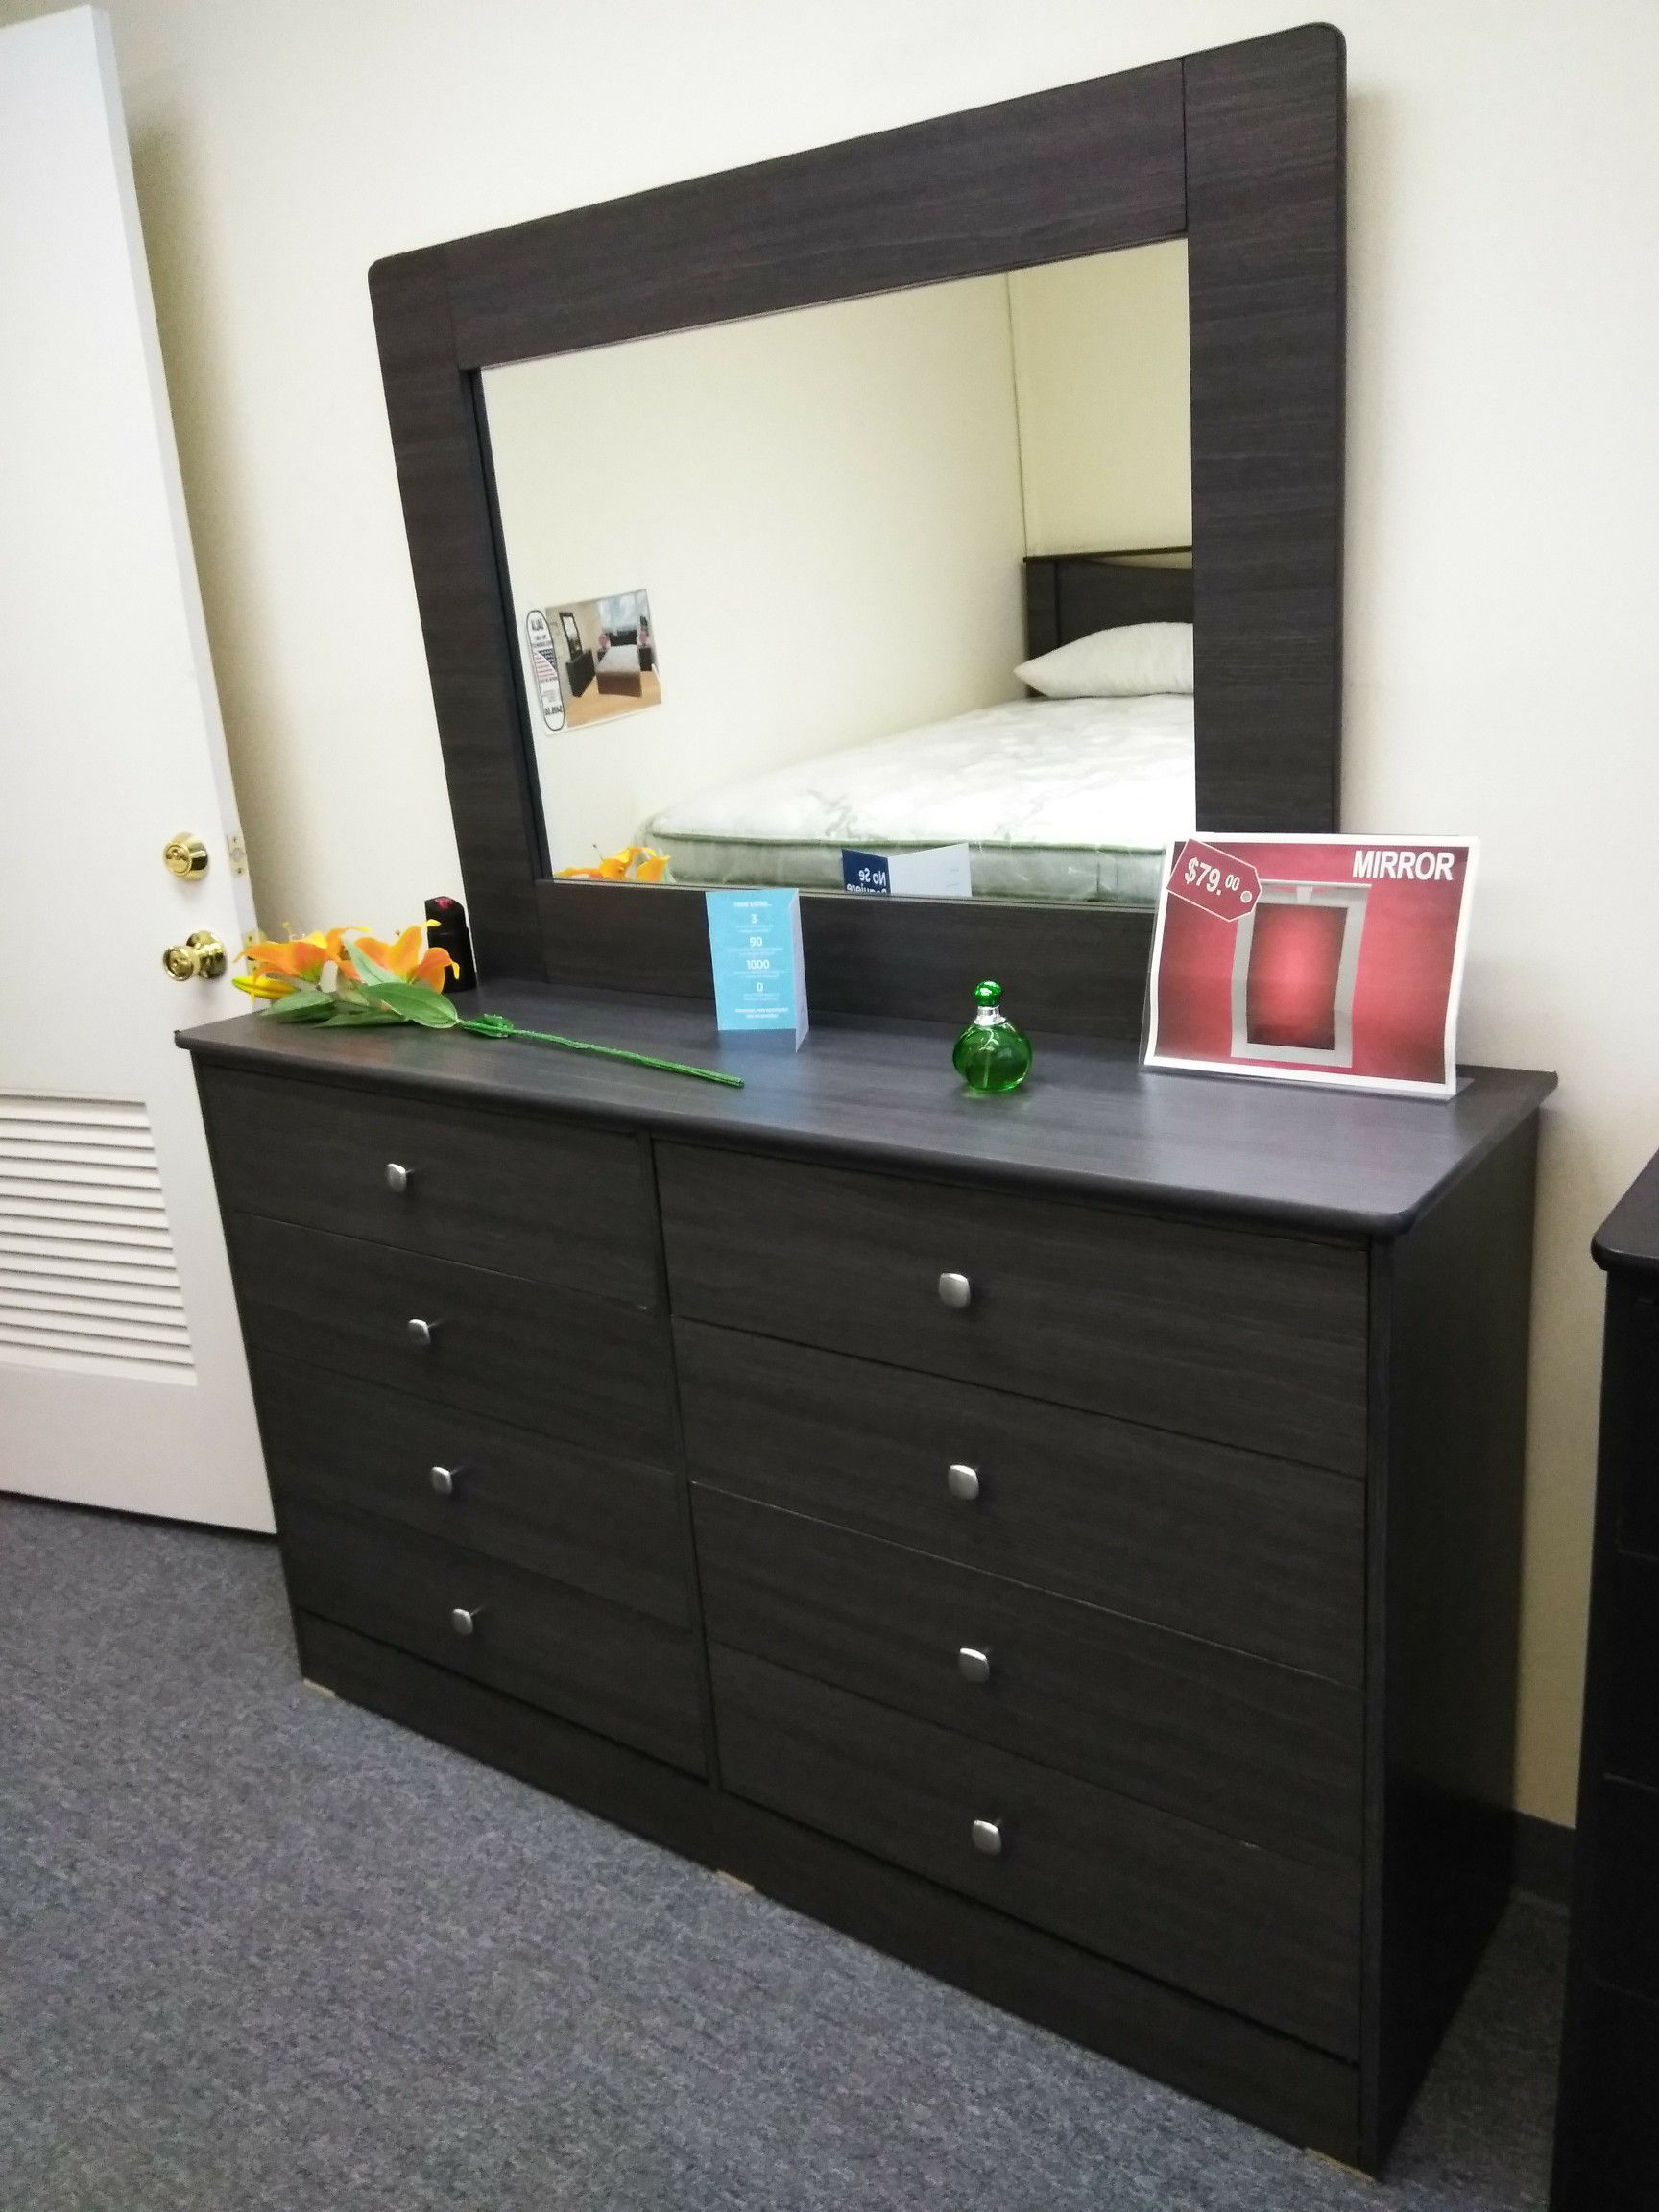 8 cabinet dresser cajonera with mirror